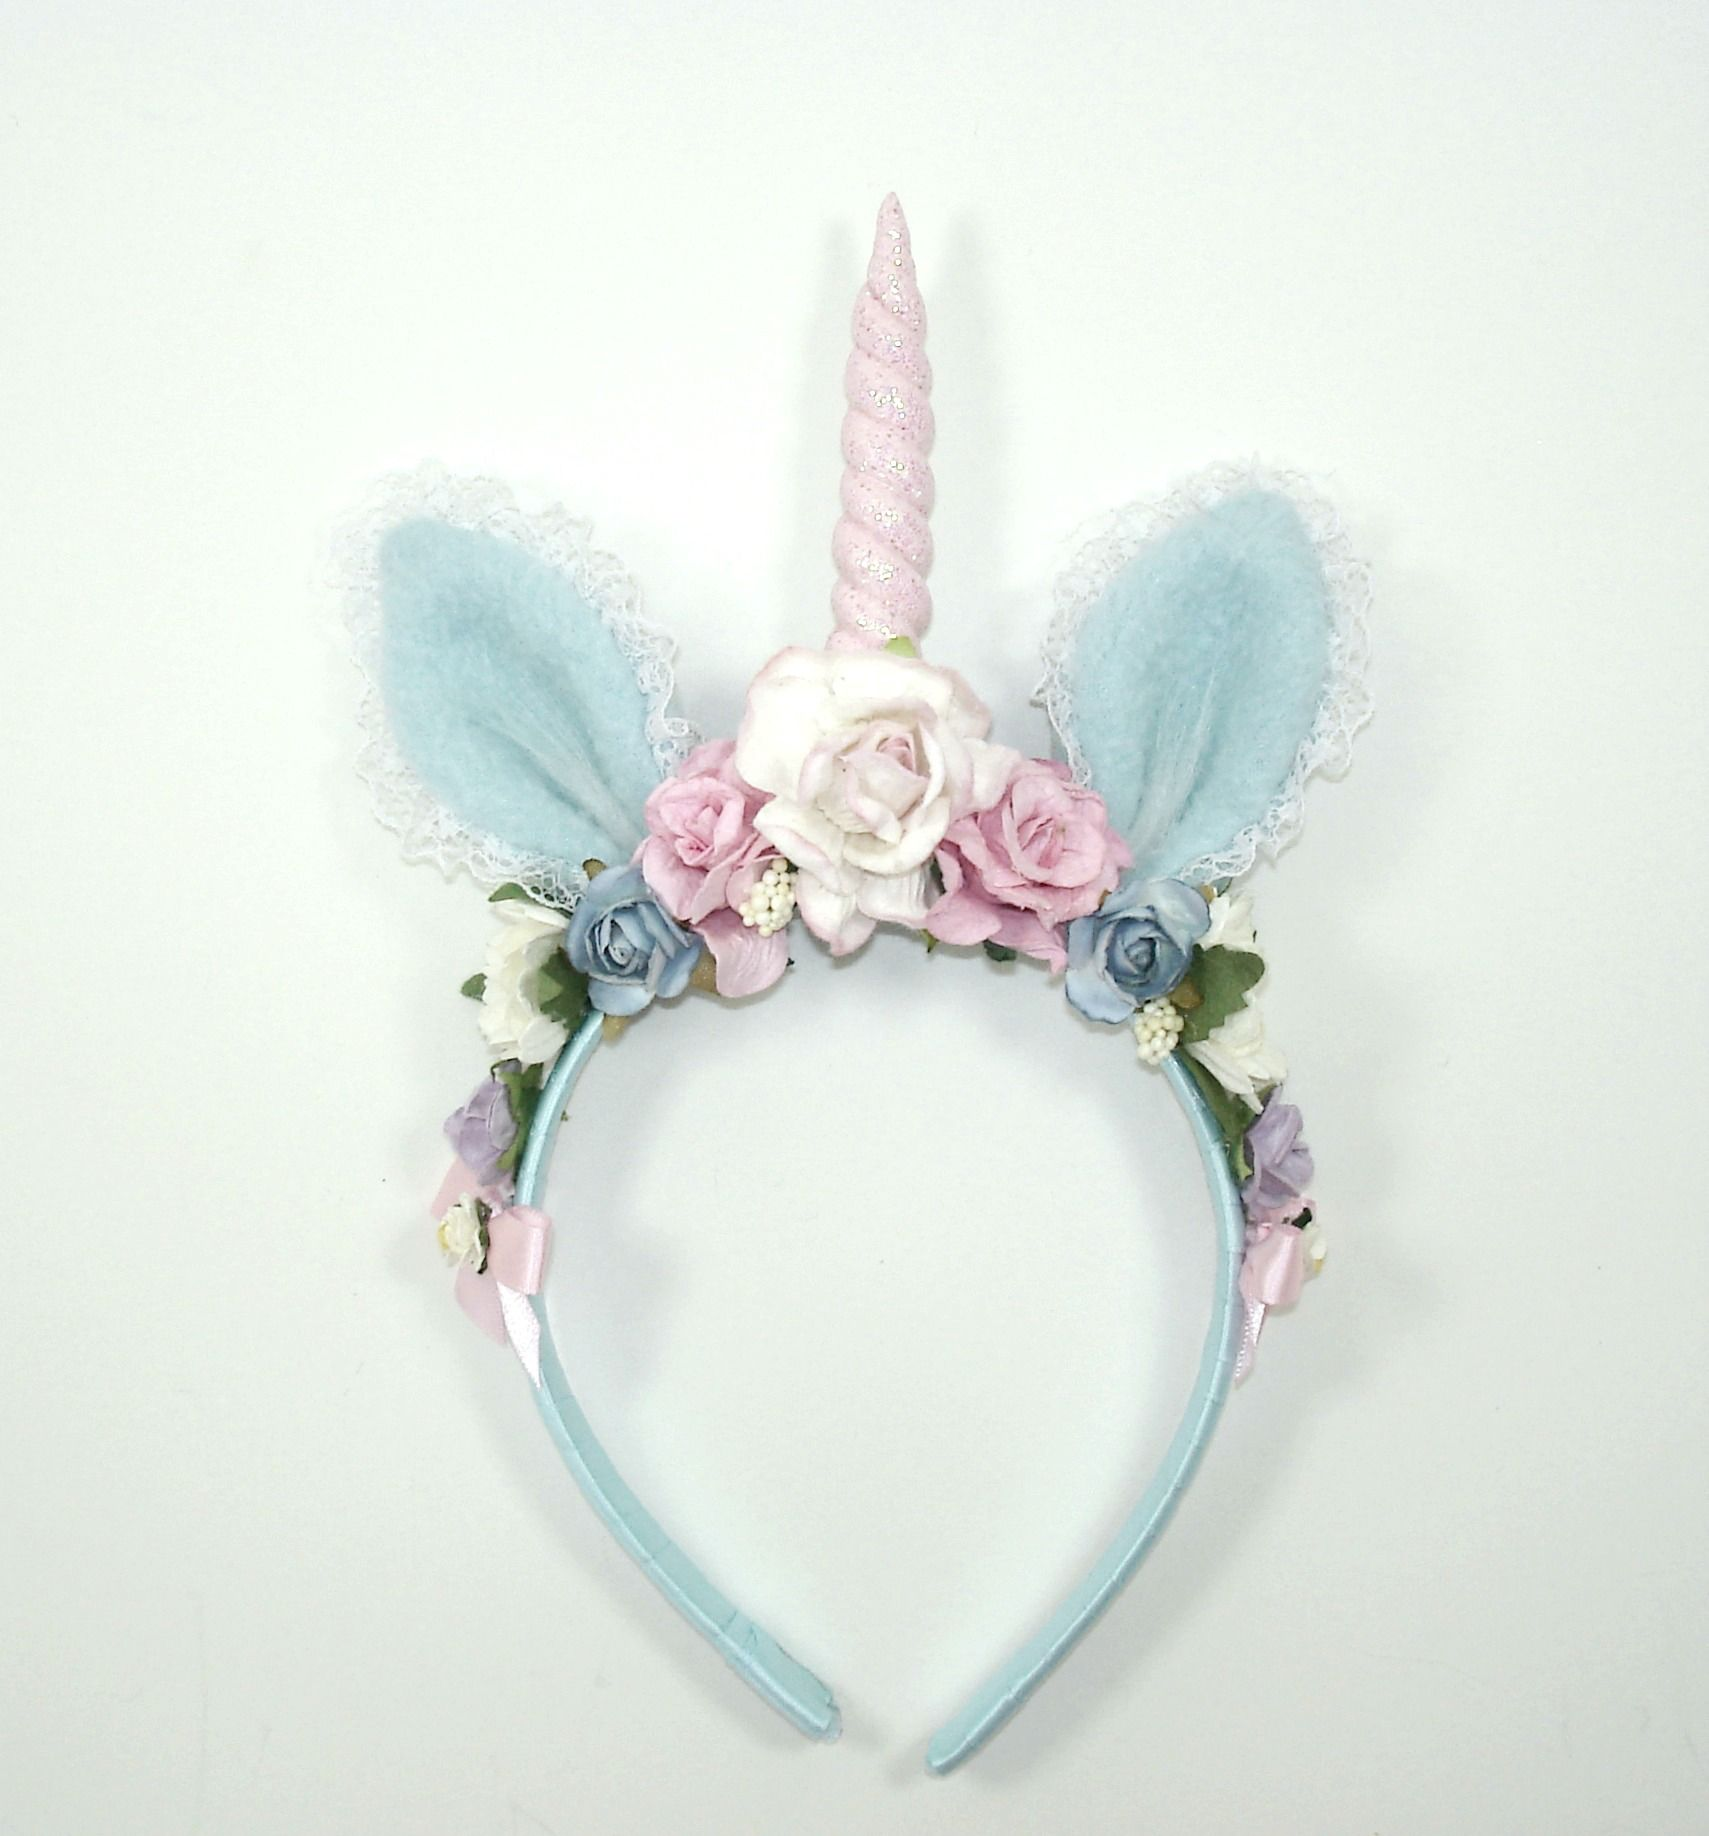 Unicorn headband-Pastel-Lolita-Lolita Headband-Harajuku-Hime-Gift For  Her-Lt Blue-Halloween-Flower Headband-Horn-Unicorn ... 8b4fe0445ba